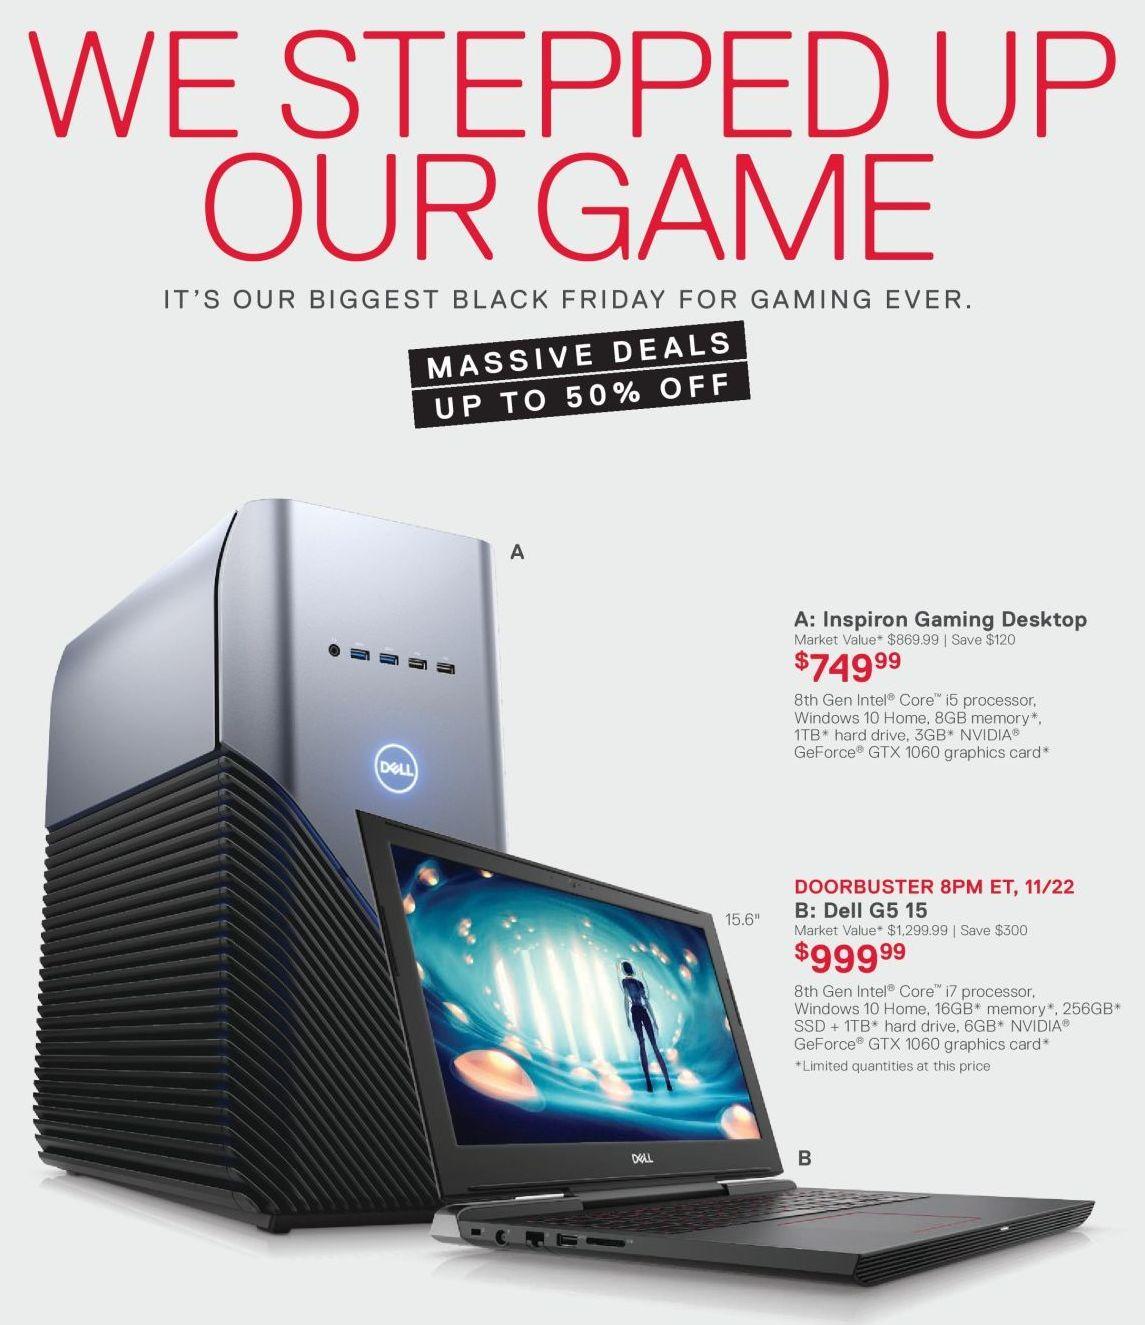 Dell G5 15 Laptop 15 6 8th Gen Intel Core I7 16gb Ram 256gb Ssd